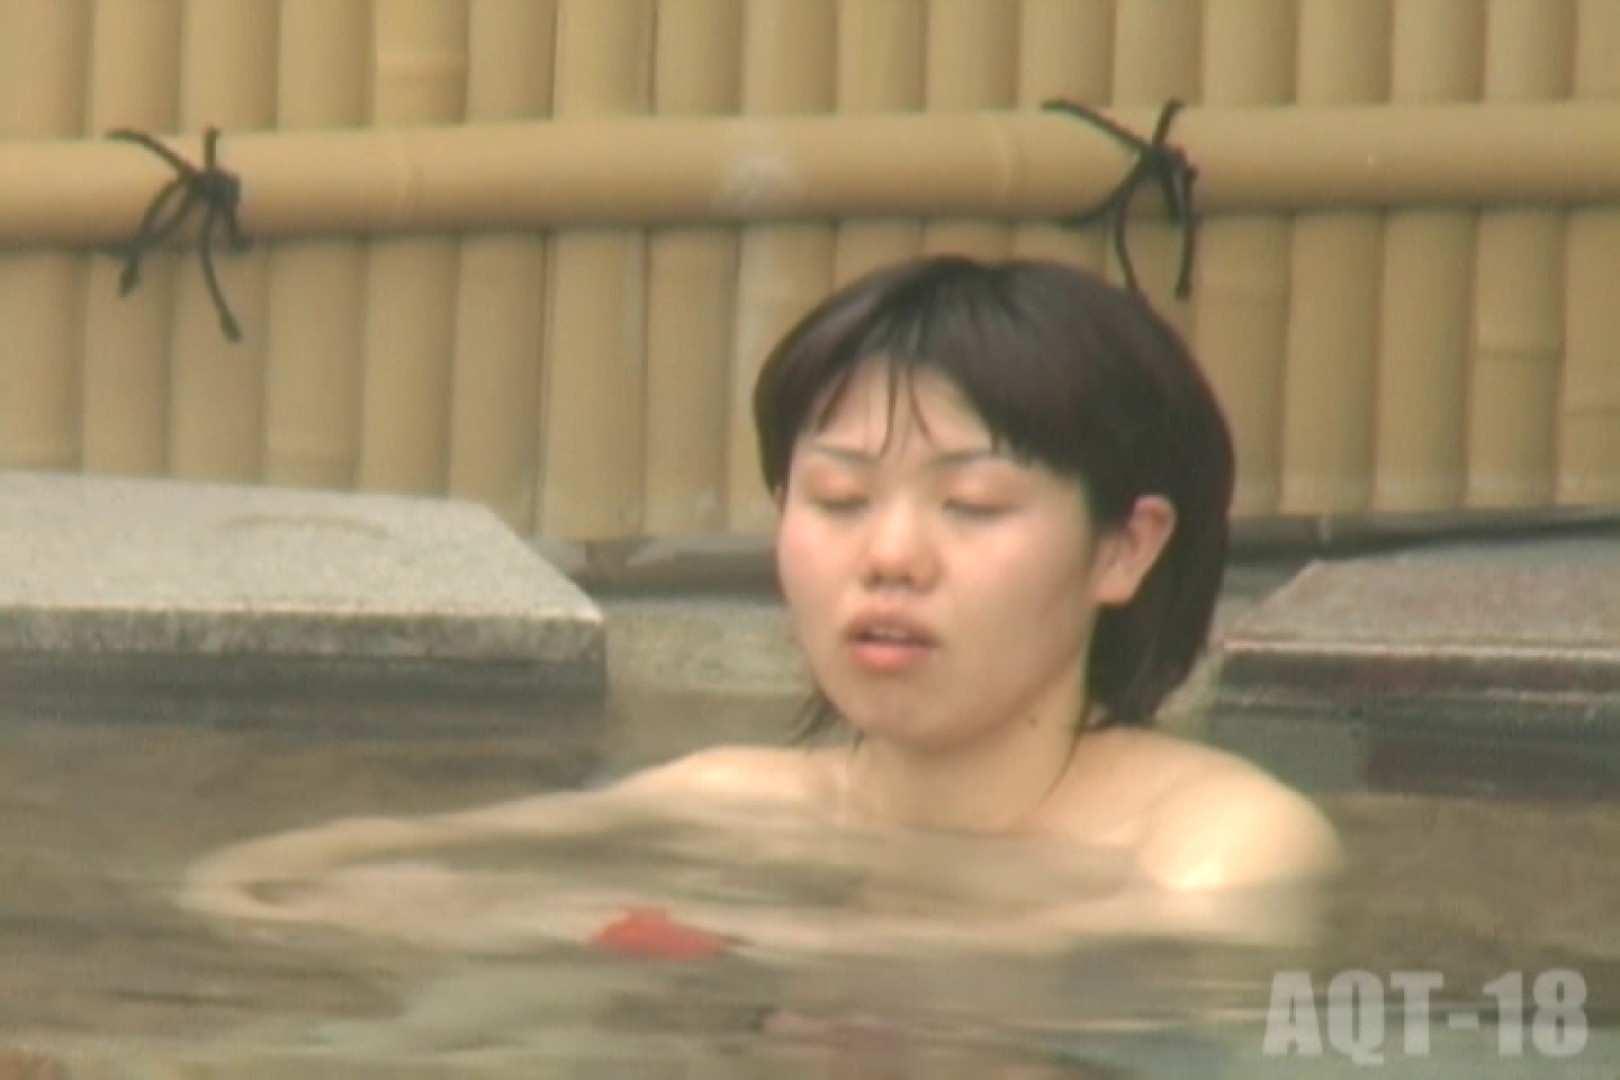 Aquaな露天風呂Vol.861 盗撮師作品  104pic 57